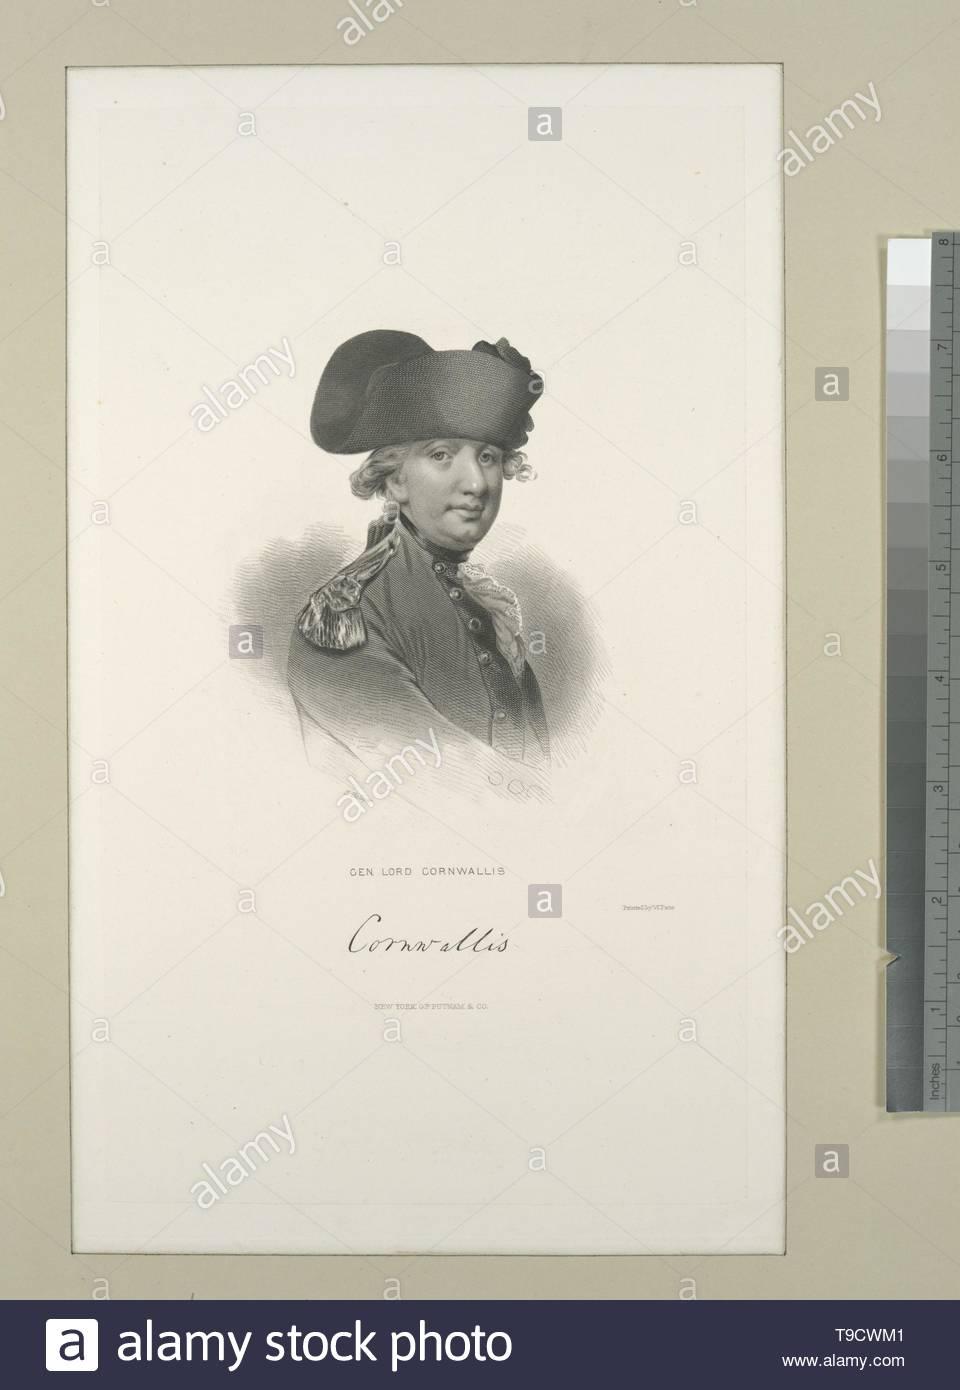 Hollyer,Samuel(1826-1919)-Gen  Lord Cornwallis - Stock Image